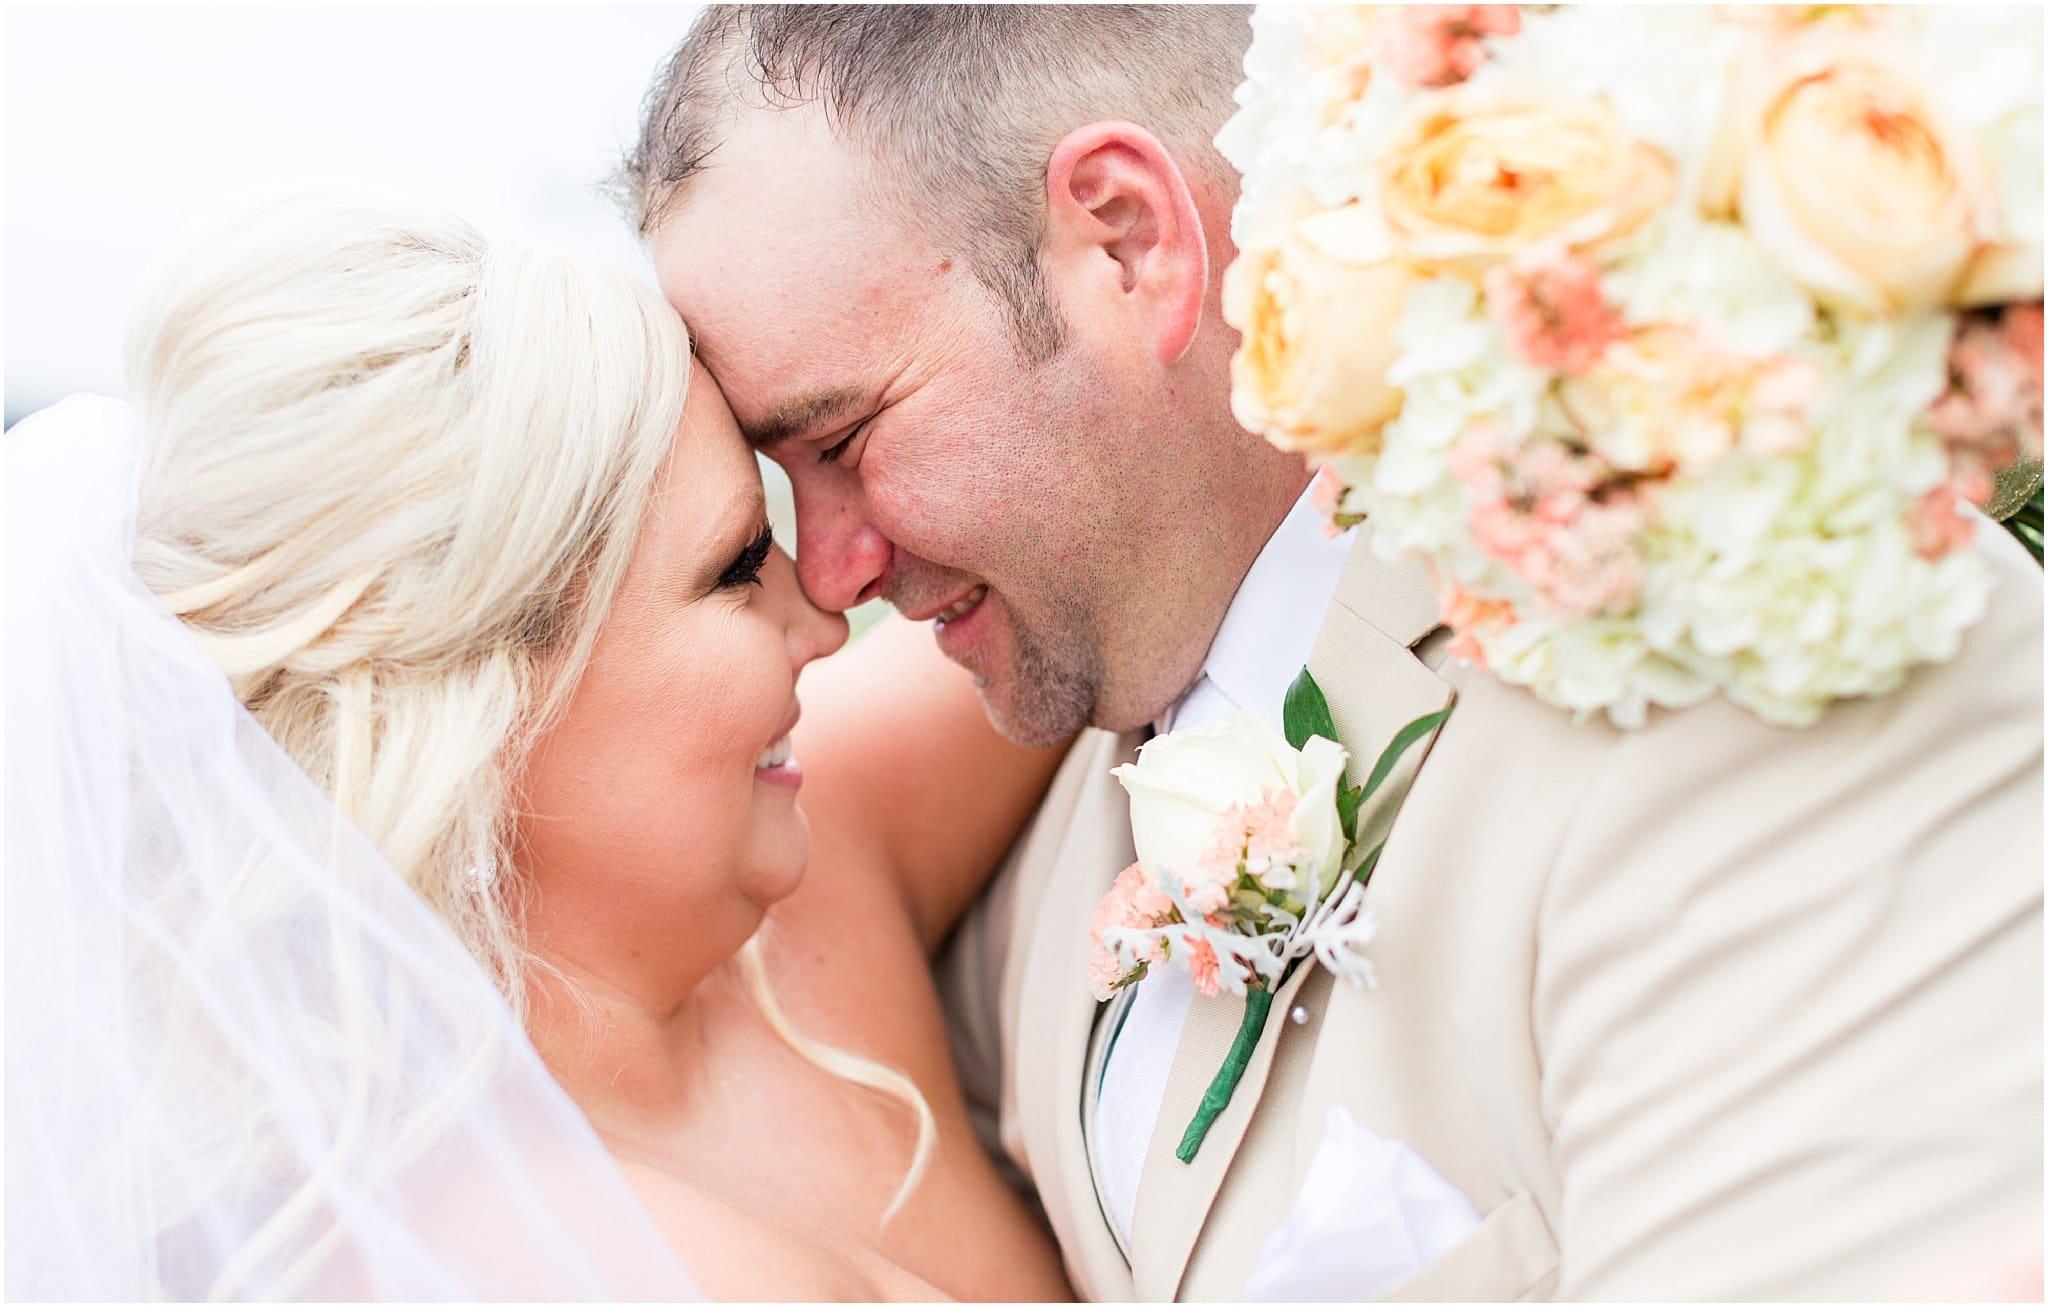 jessscott-milsboro-delaware-wedding-cassidymrphotography_0058